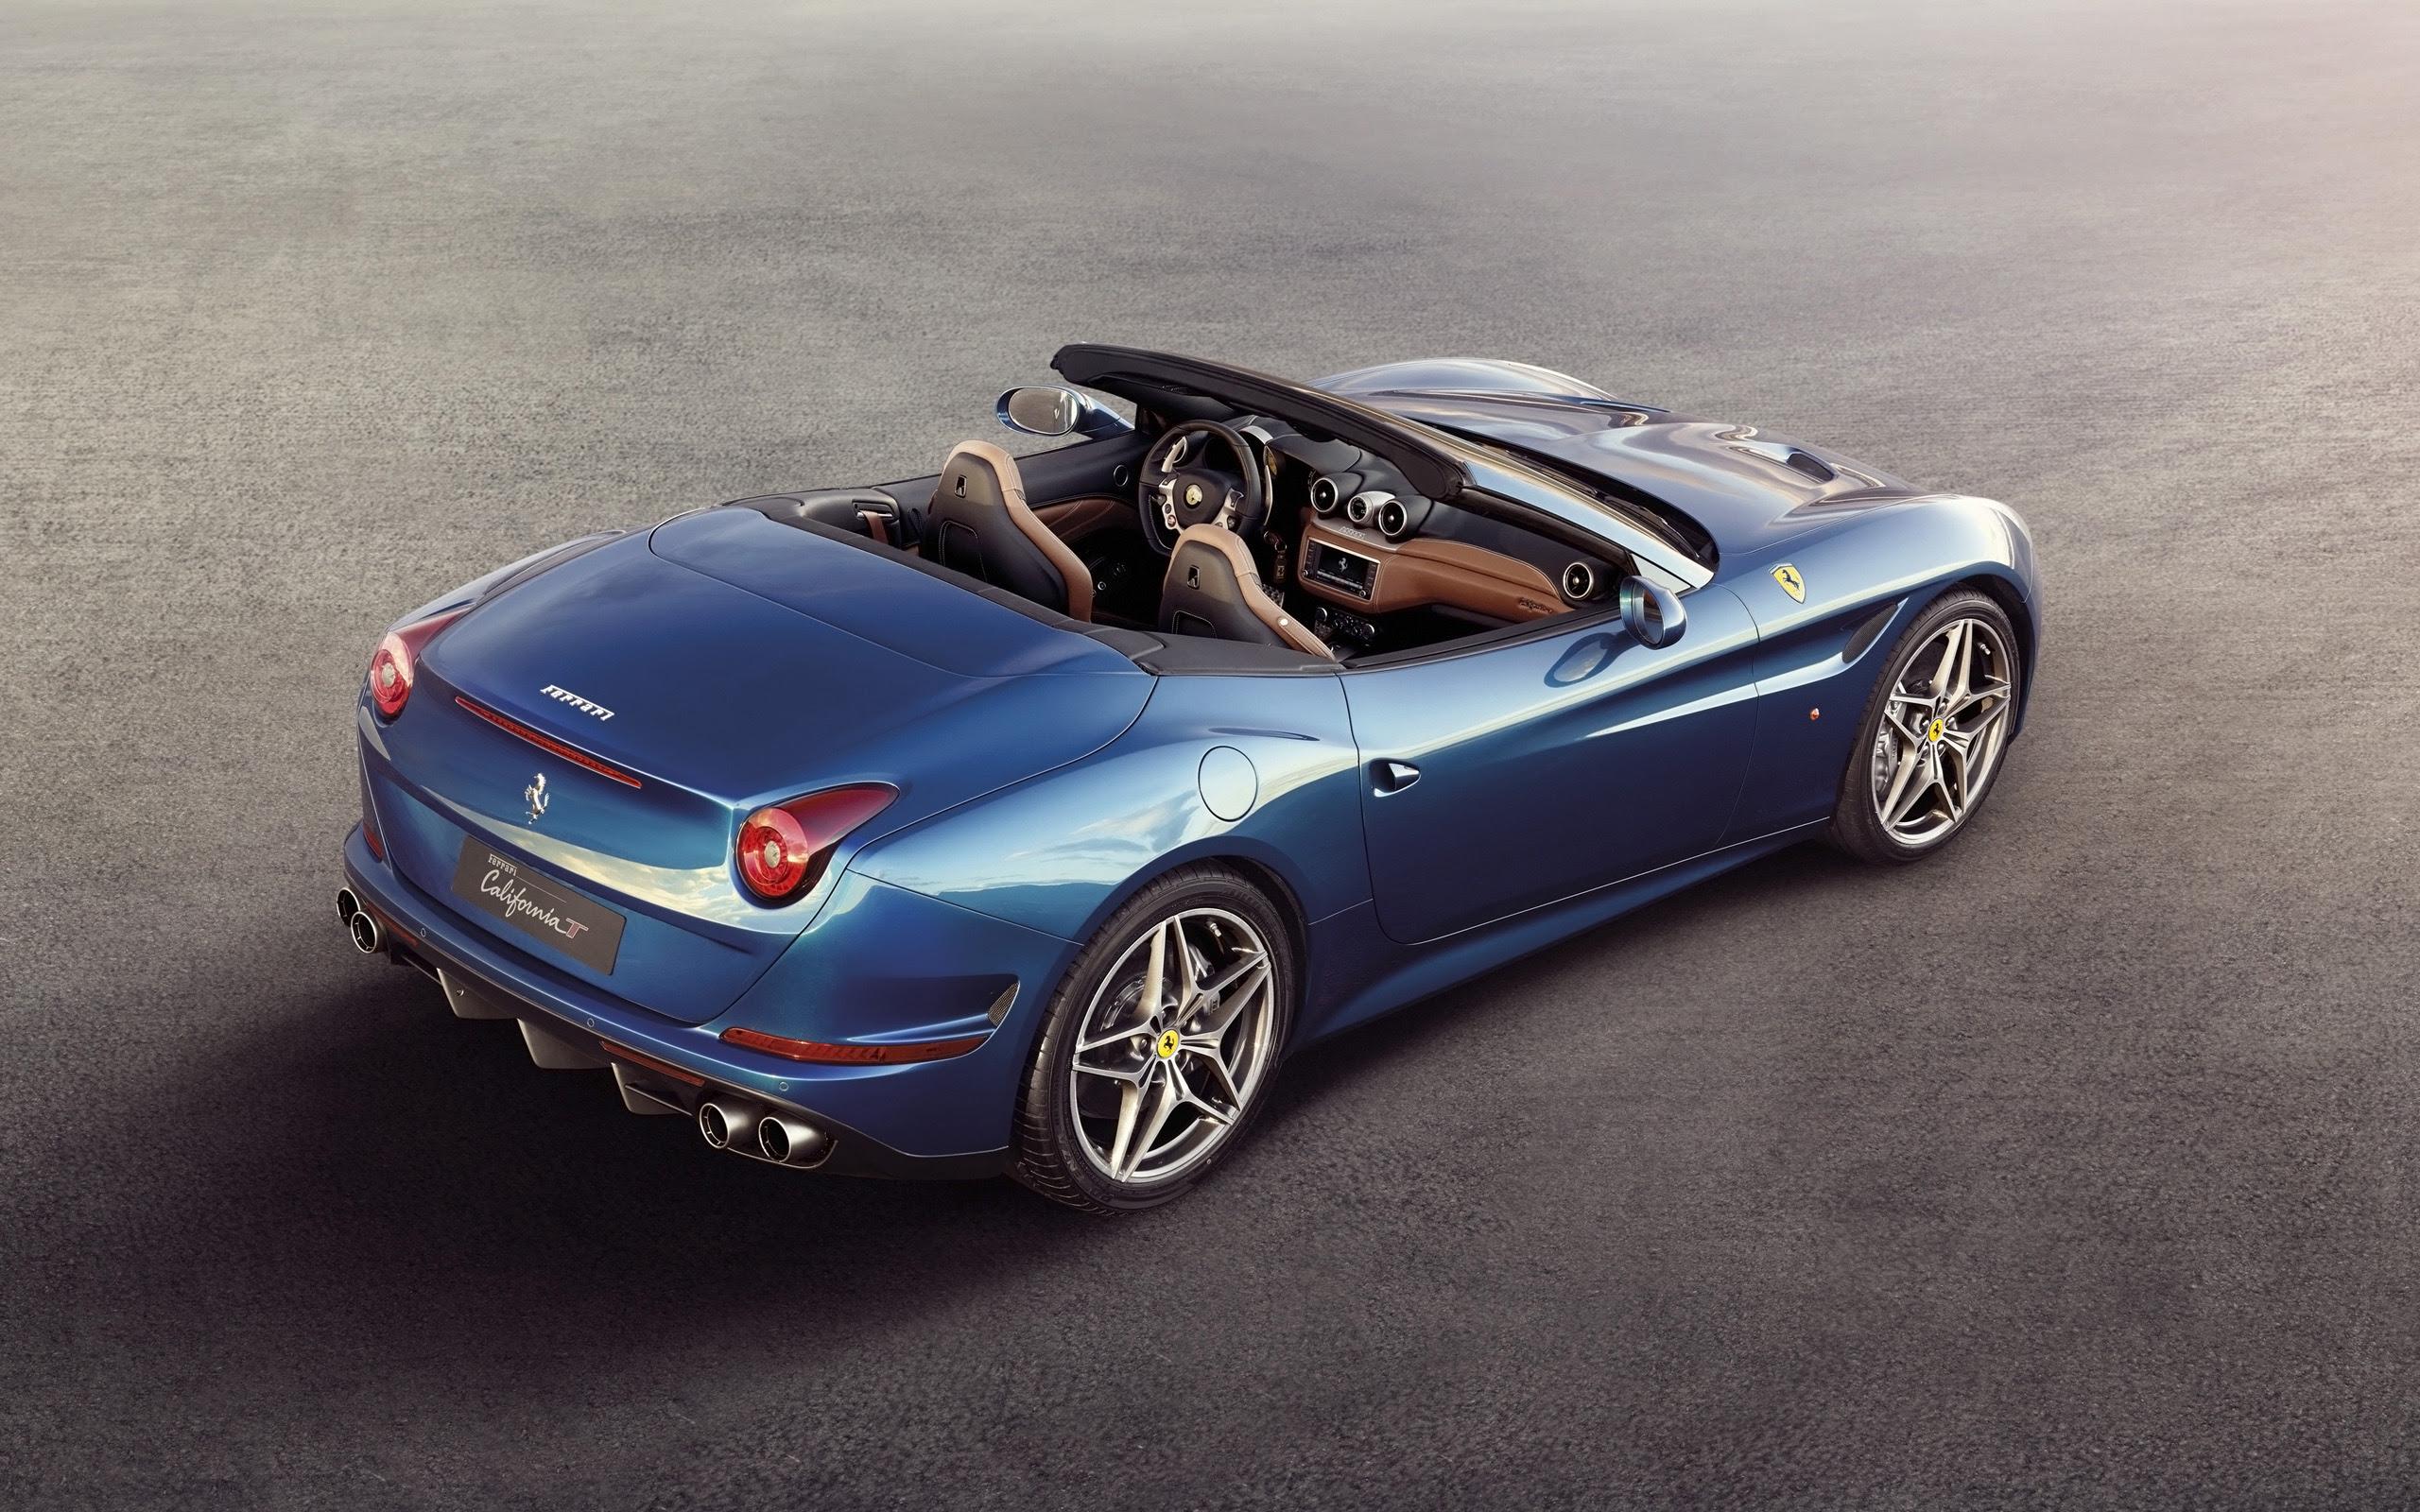 2014 Ferrari California T 3 Wallpaper   HD Car Wallpapers ...